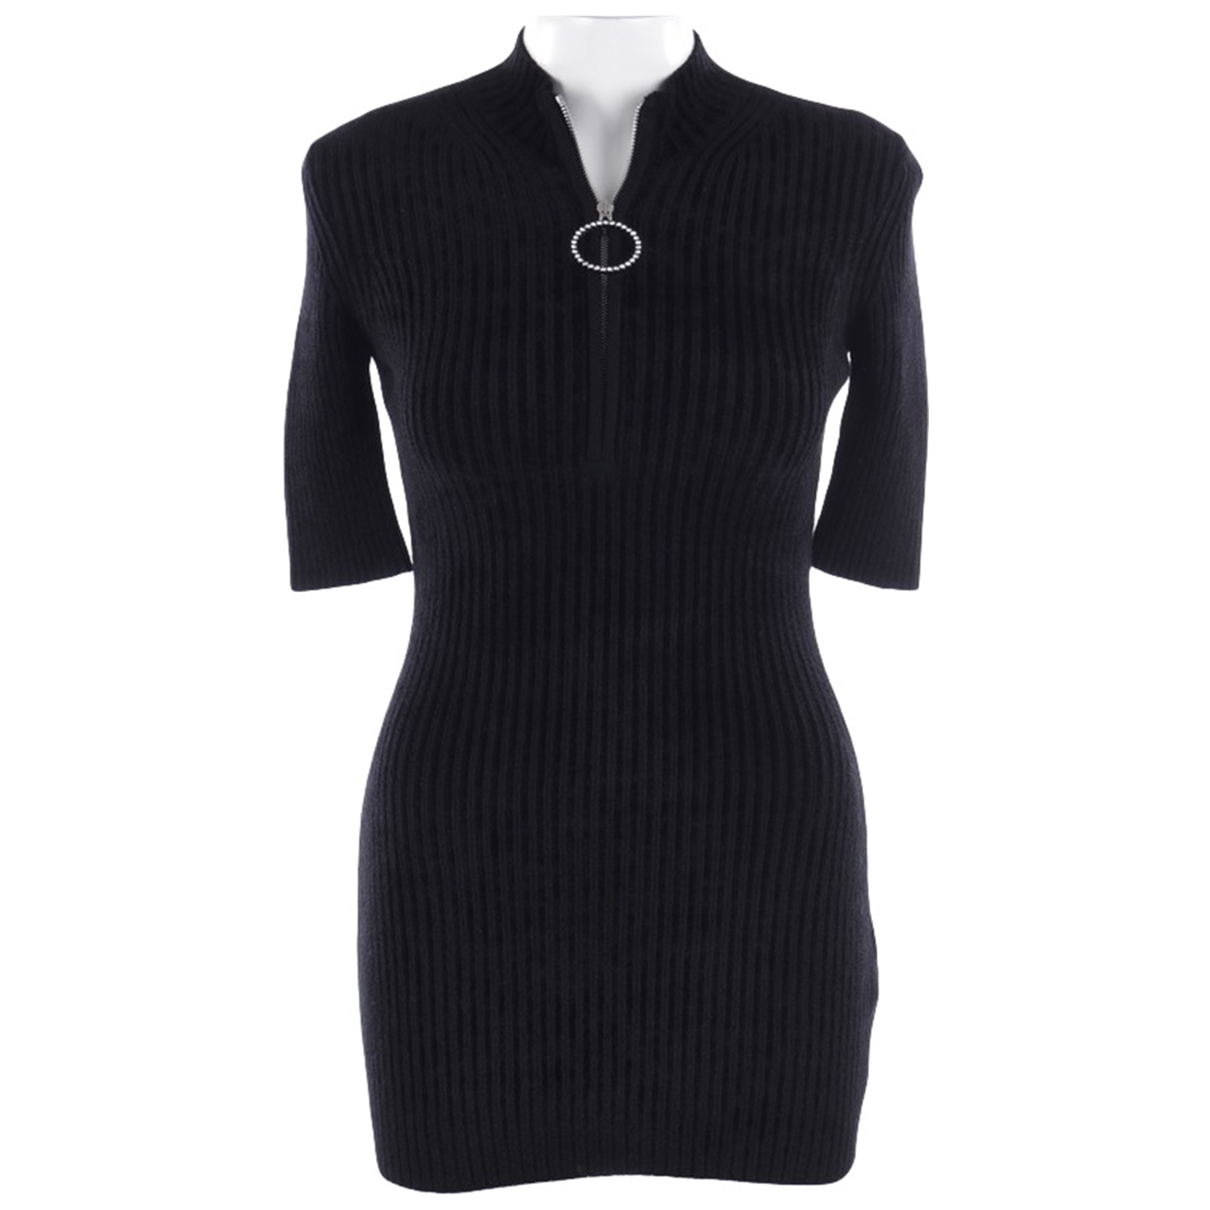 Emilio Pucci \N Black dress for Women S International